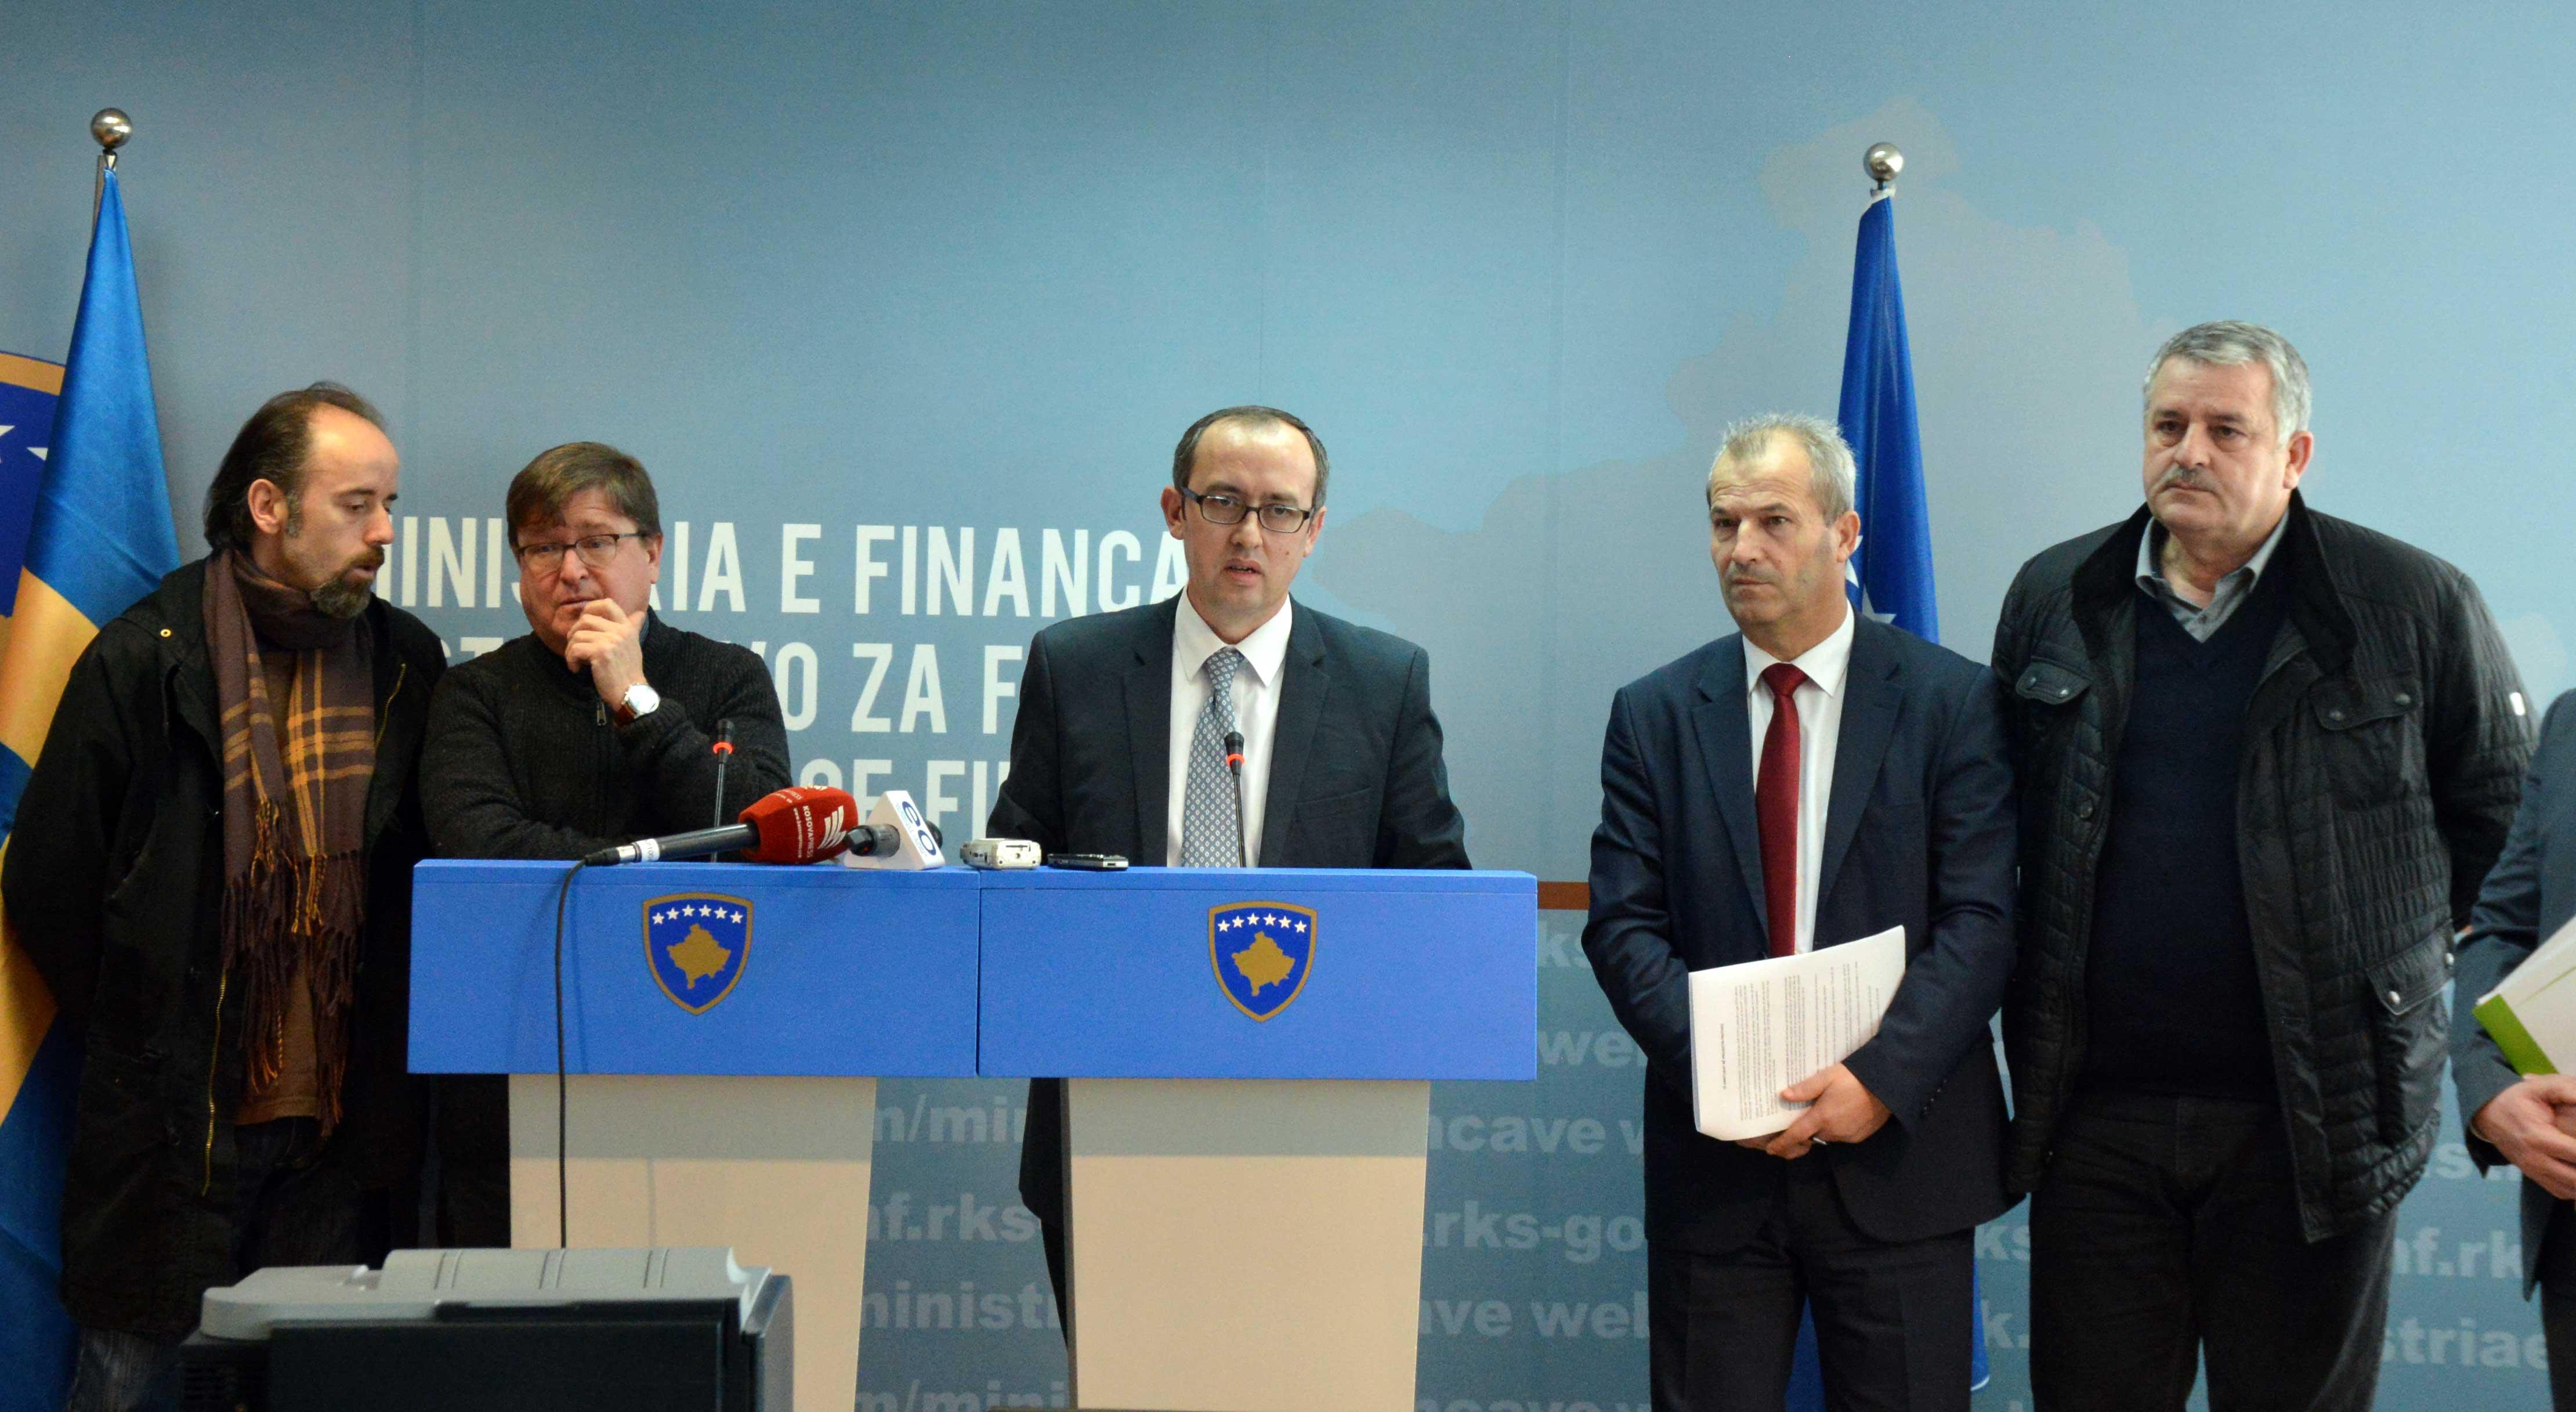 Administrata tatimore kosoves online dating 10